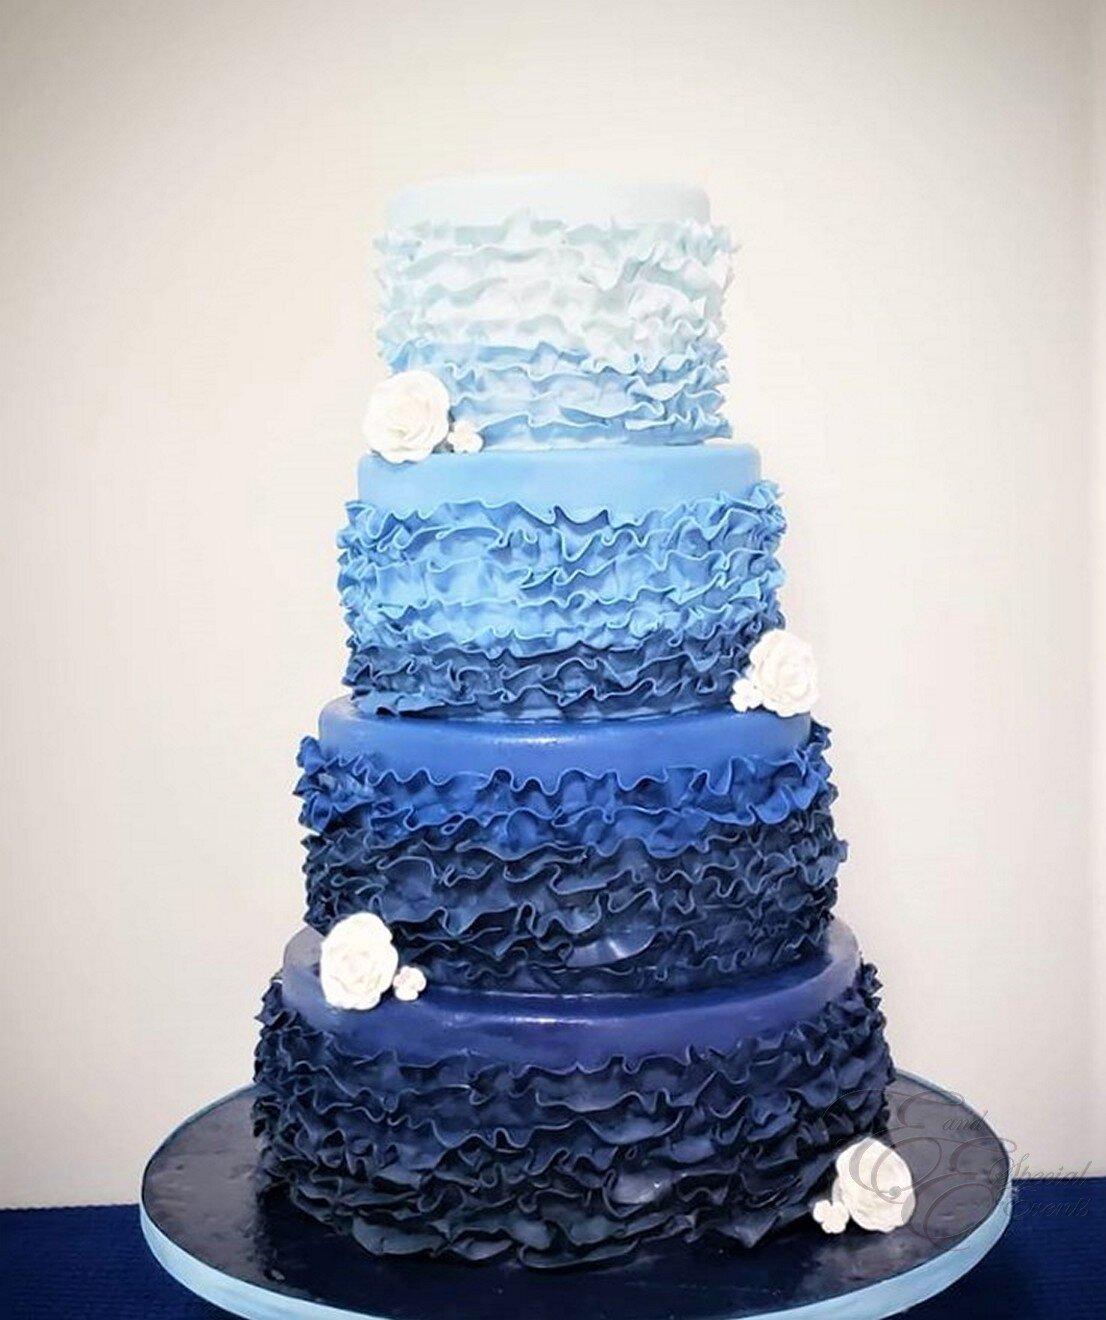 blue ombre wedding cake with fondant ruffles.jpg